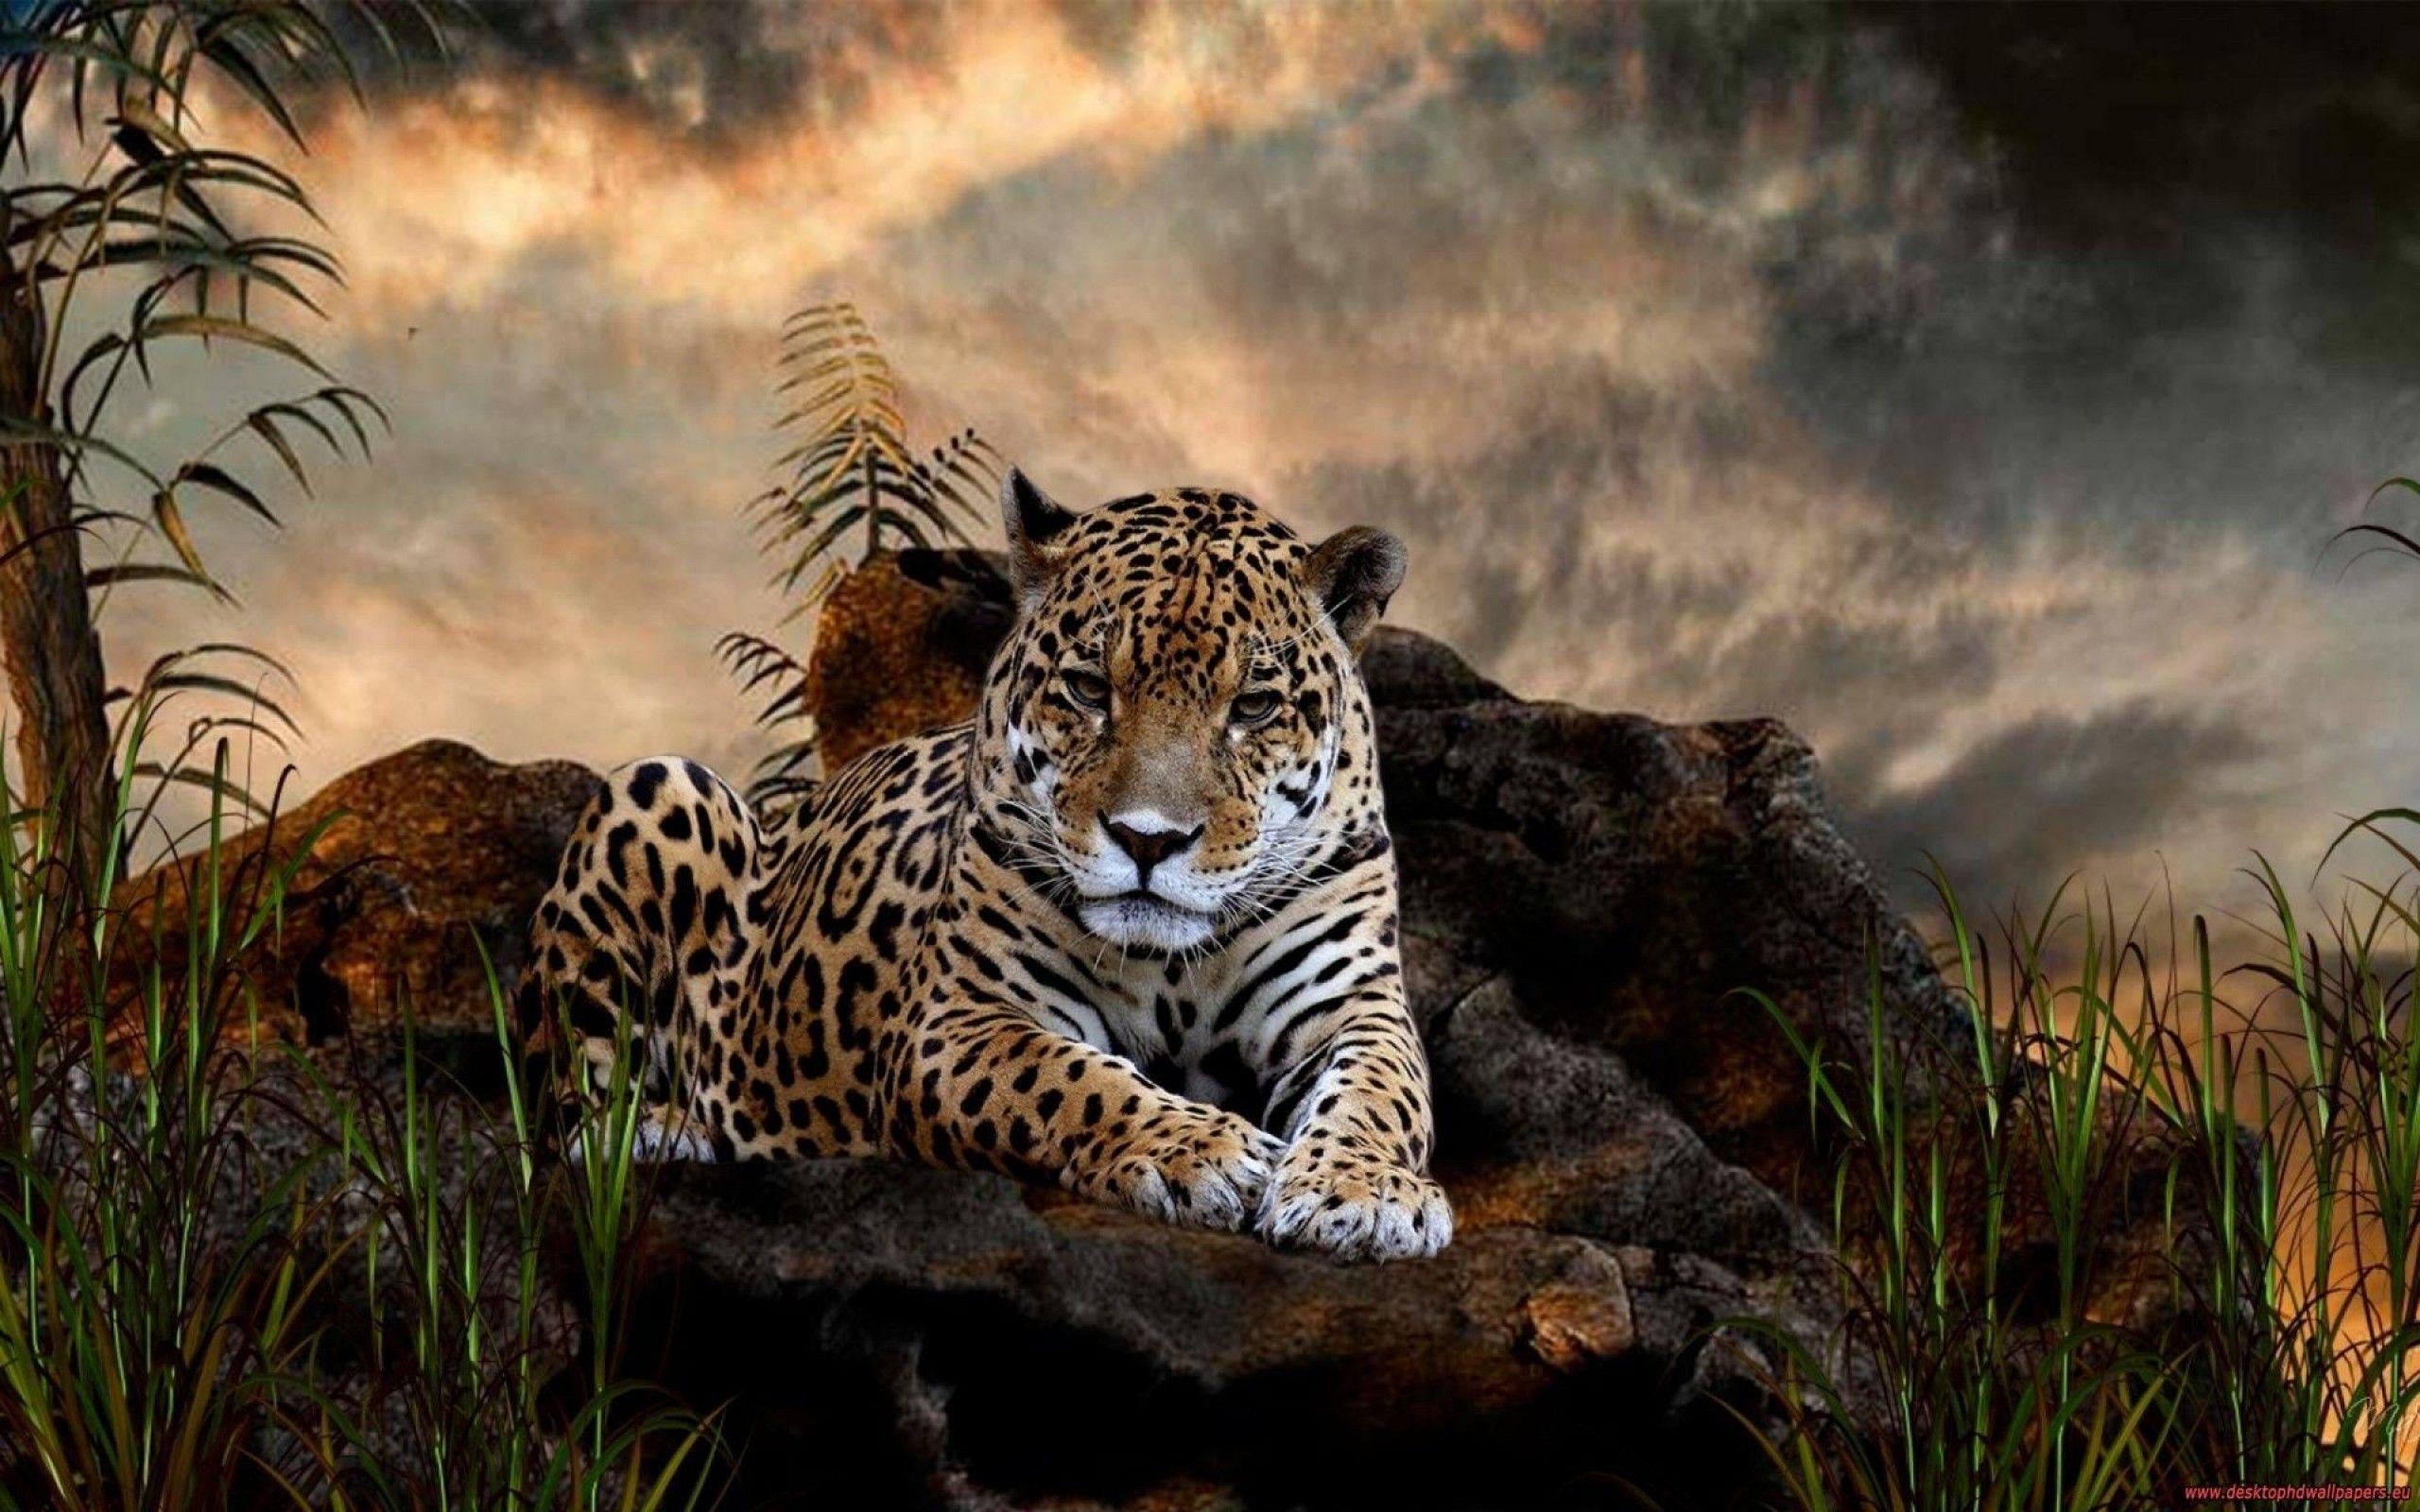 wild animals hd desktop wallpapers | places to visit | pinterest